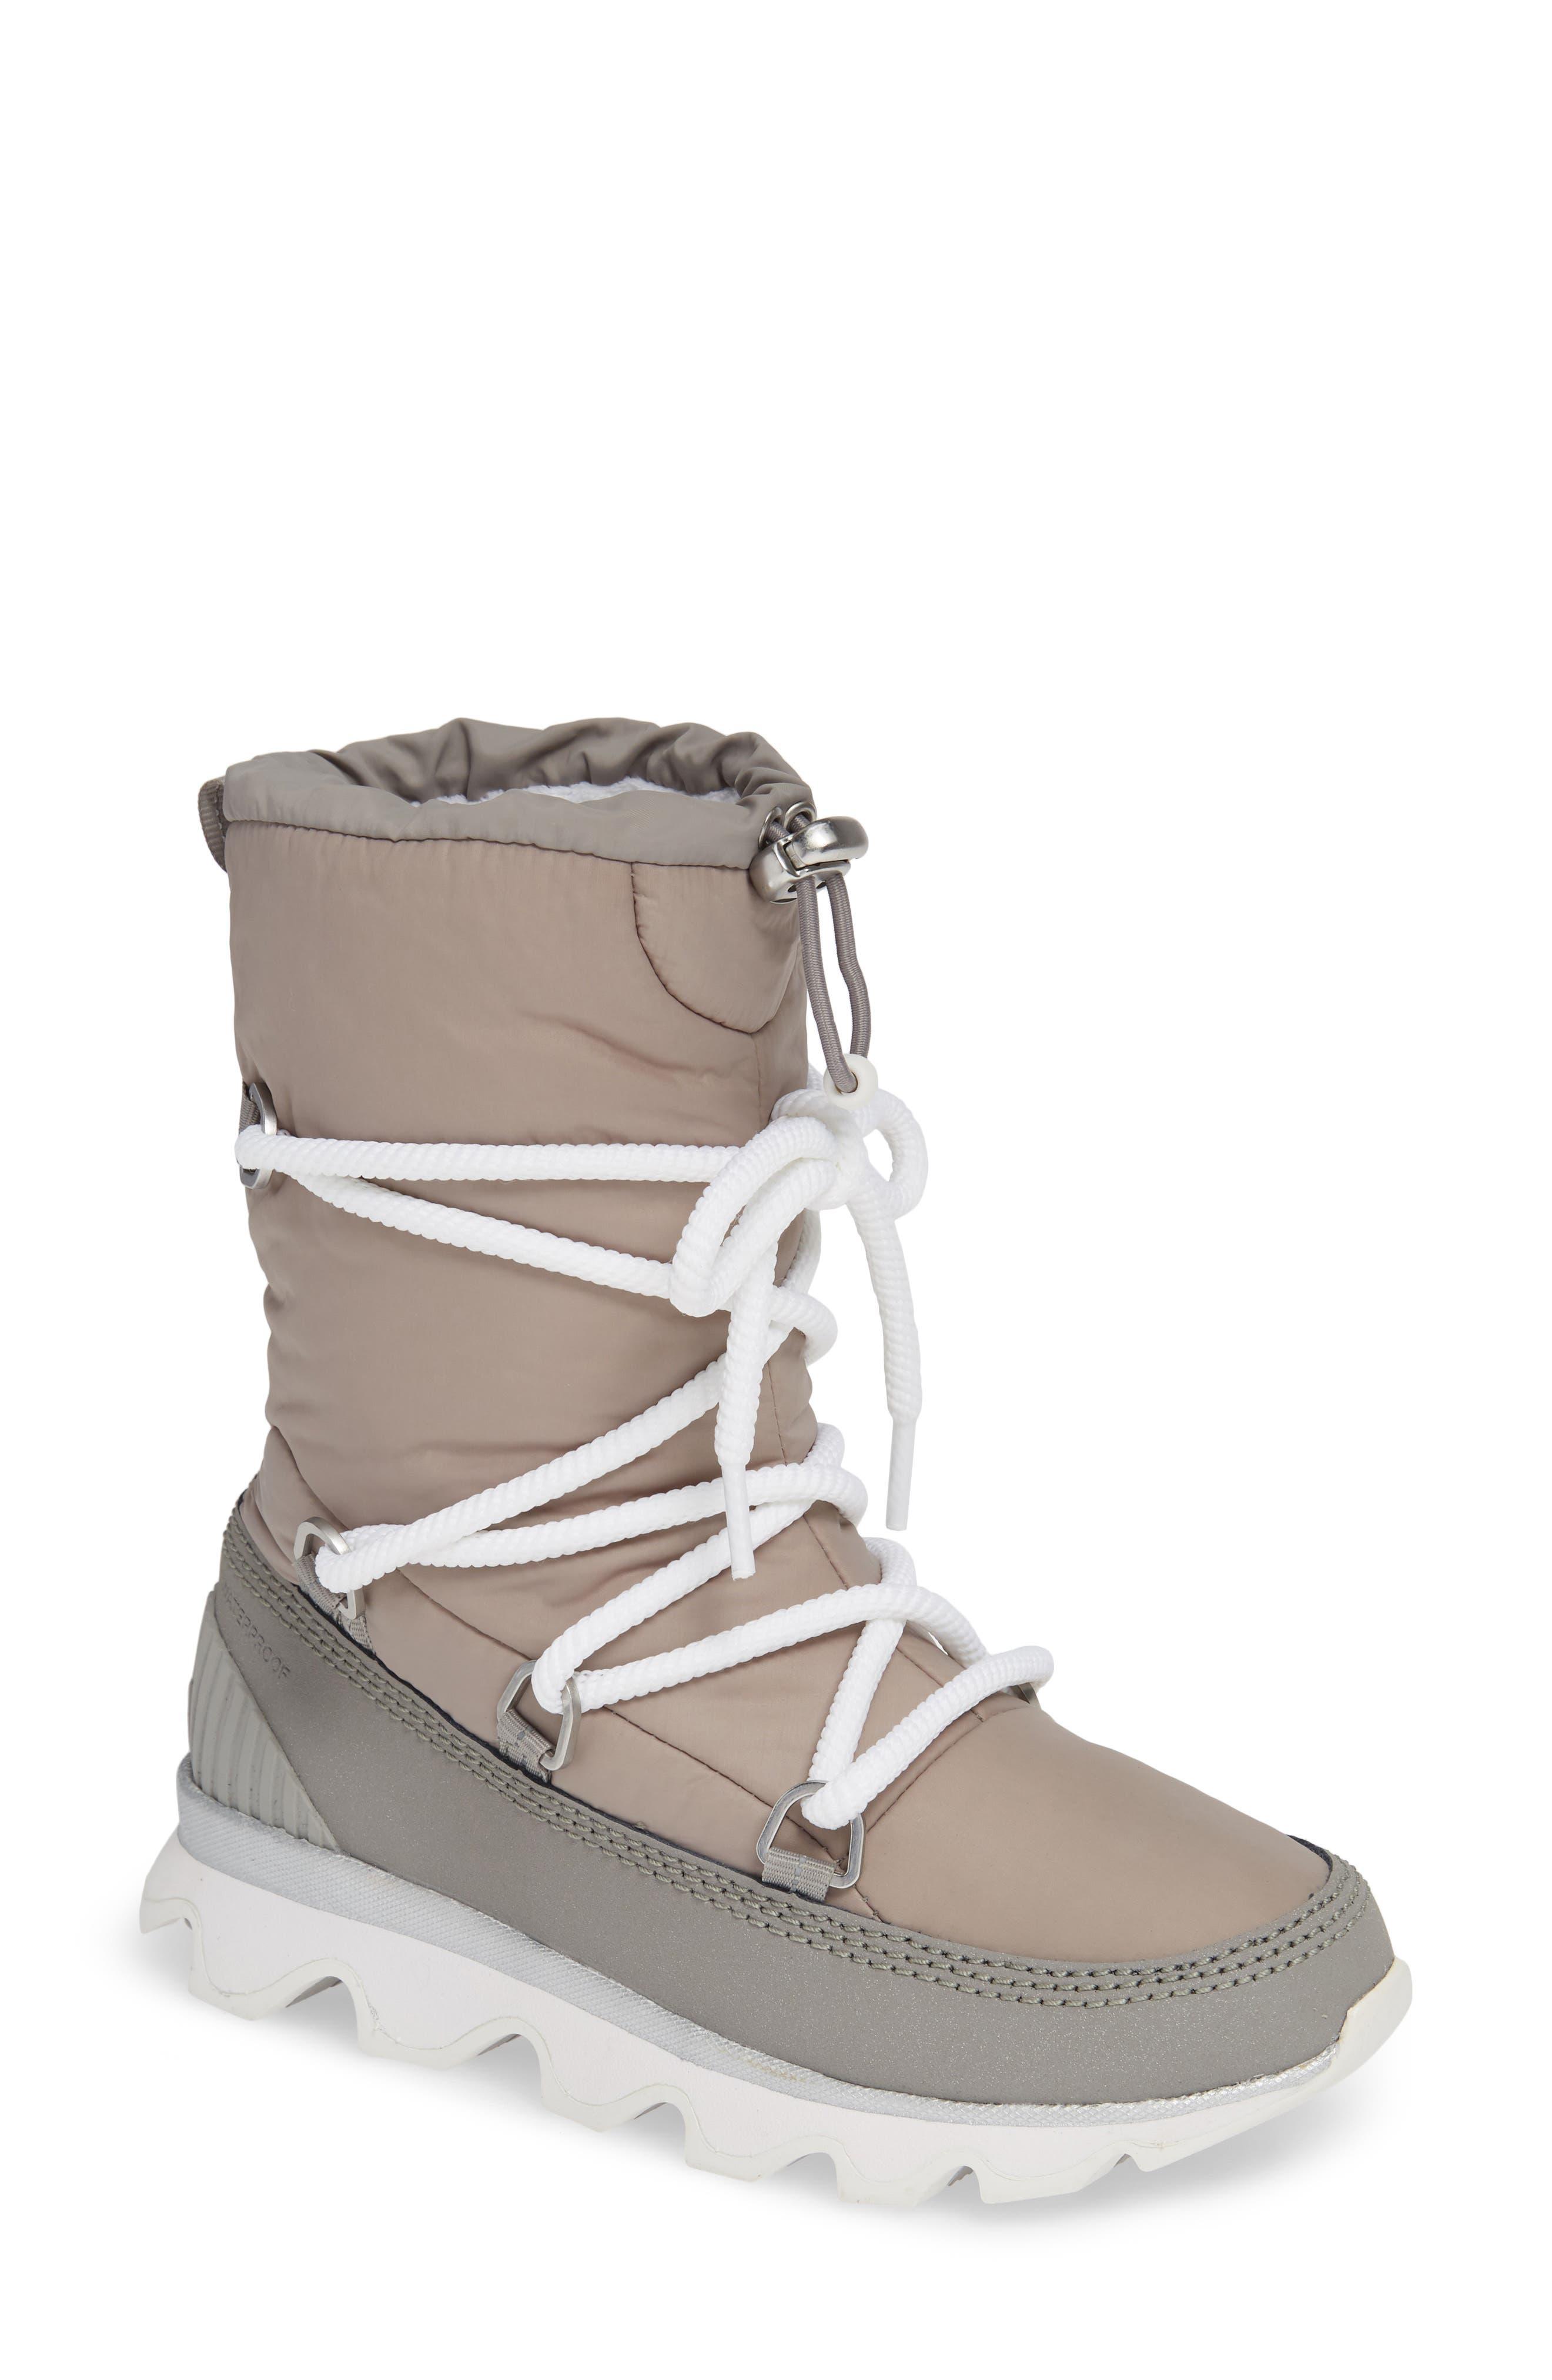 Sorel Kinetic Waterproof Insulated Winter Boot, Grey